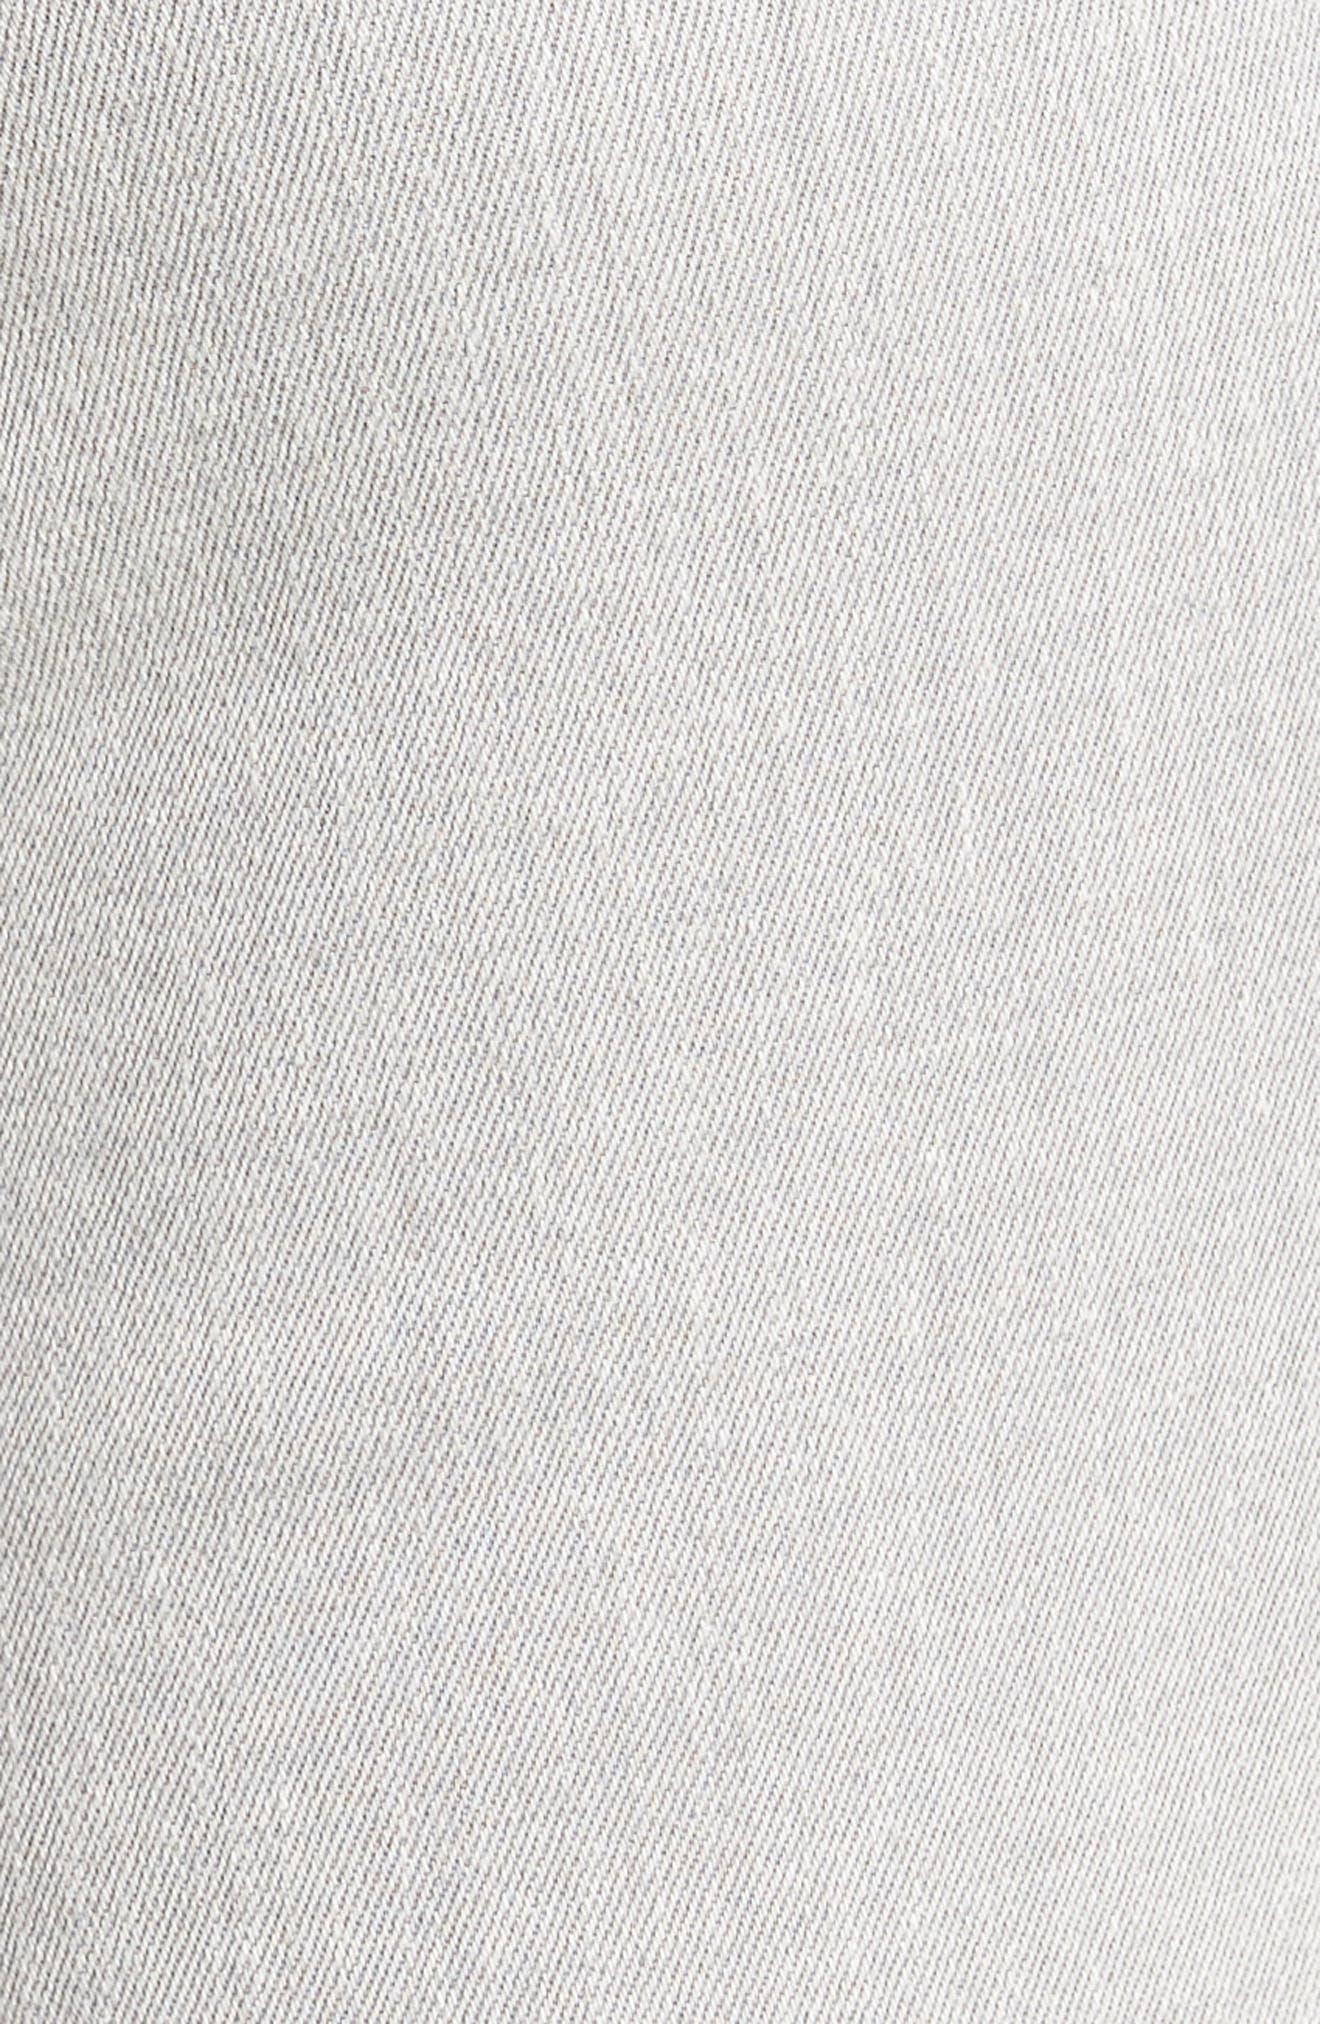 'Dayla' Colored Wide Cuff Capri Jeans,                             Alternate thumbnail 58, color,